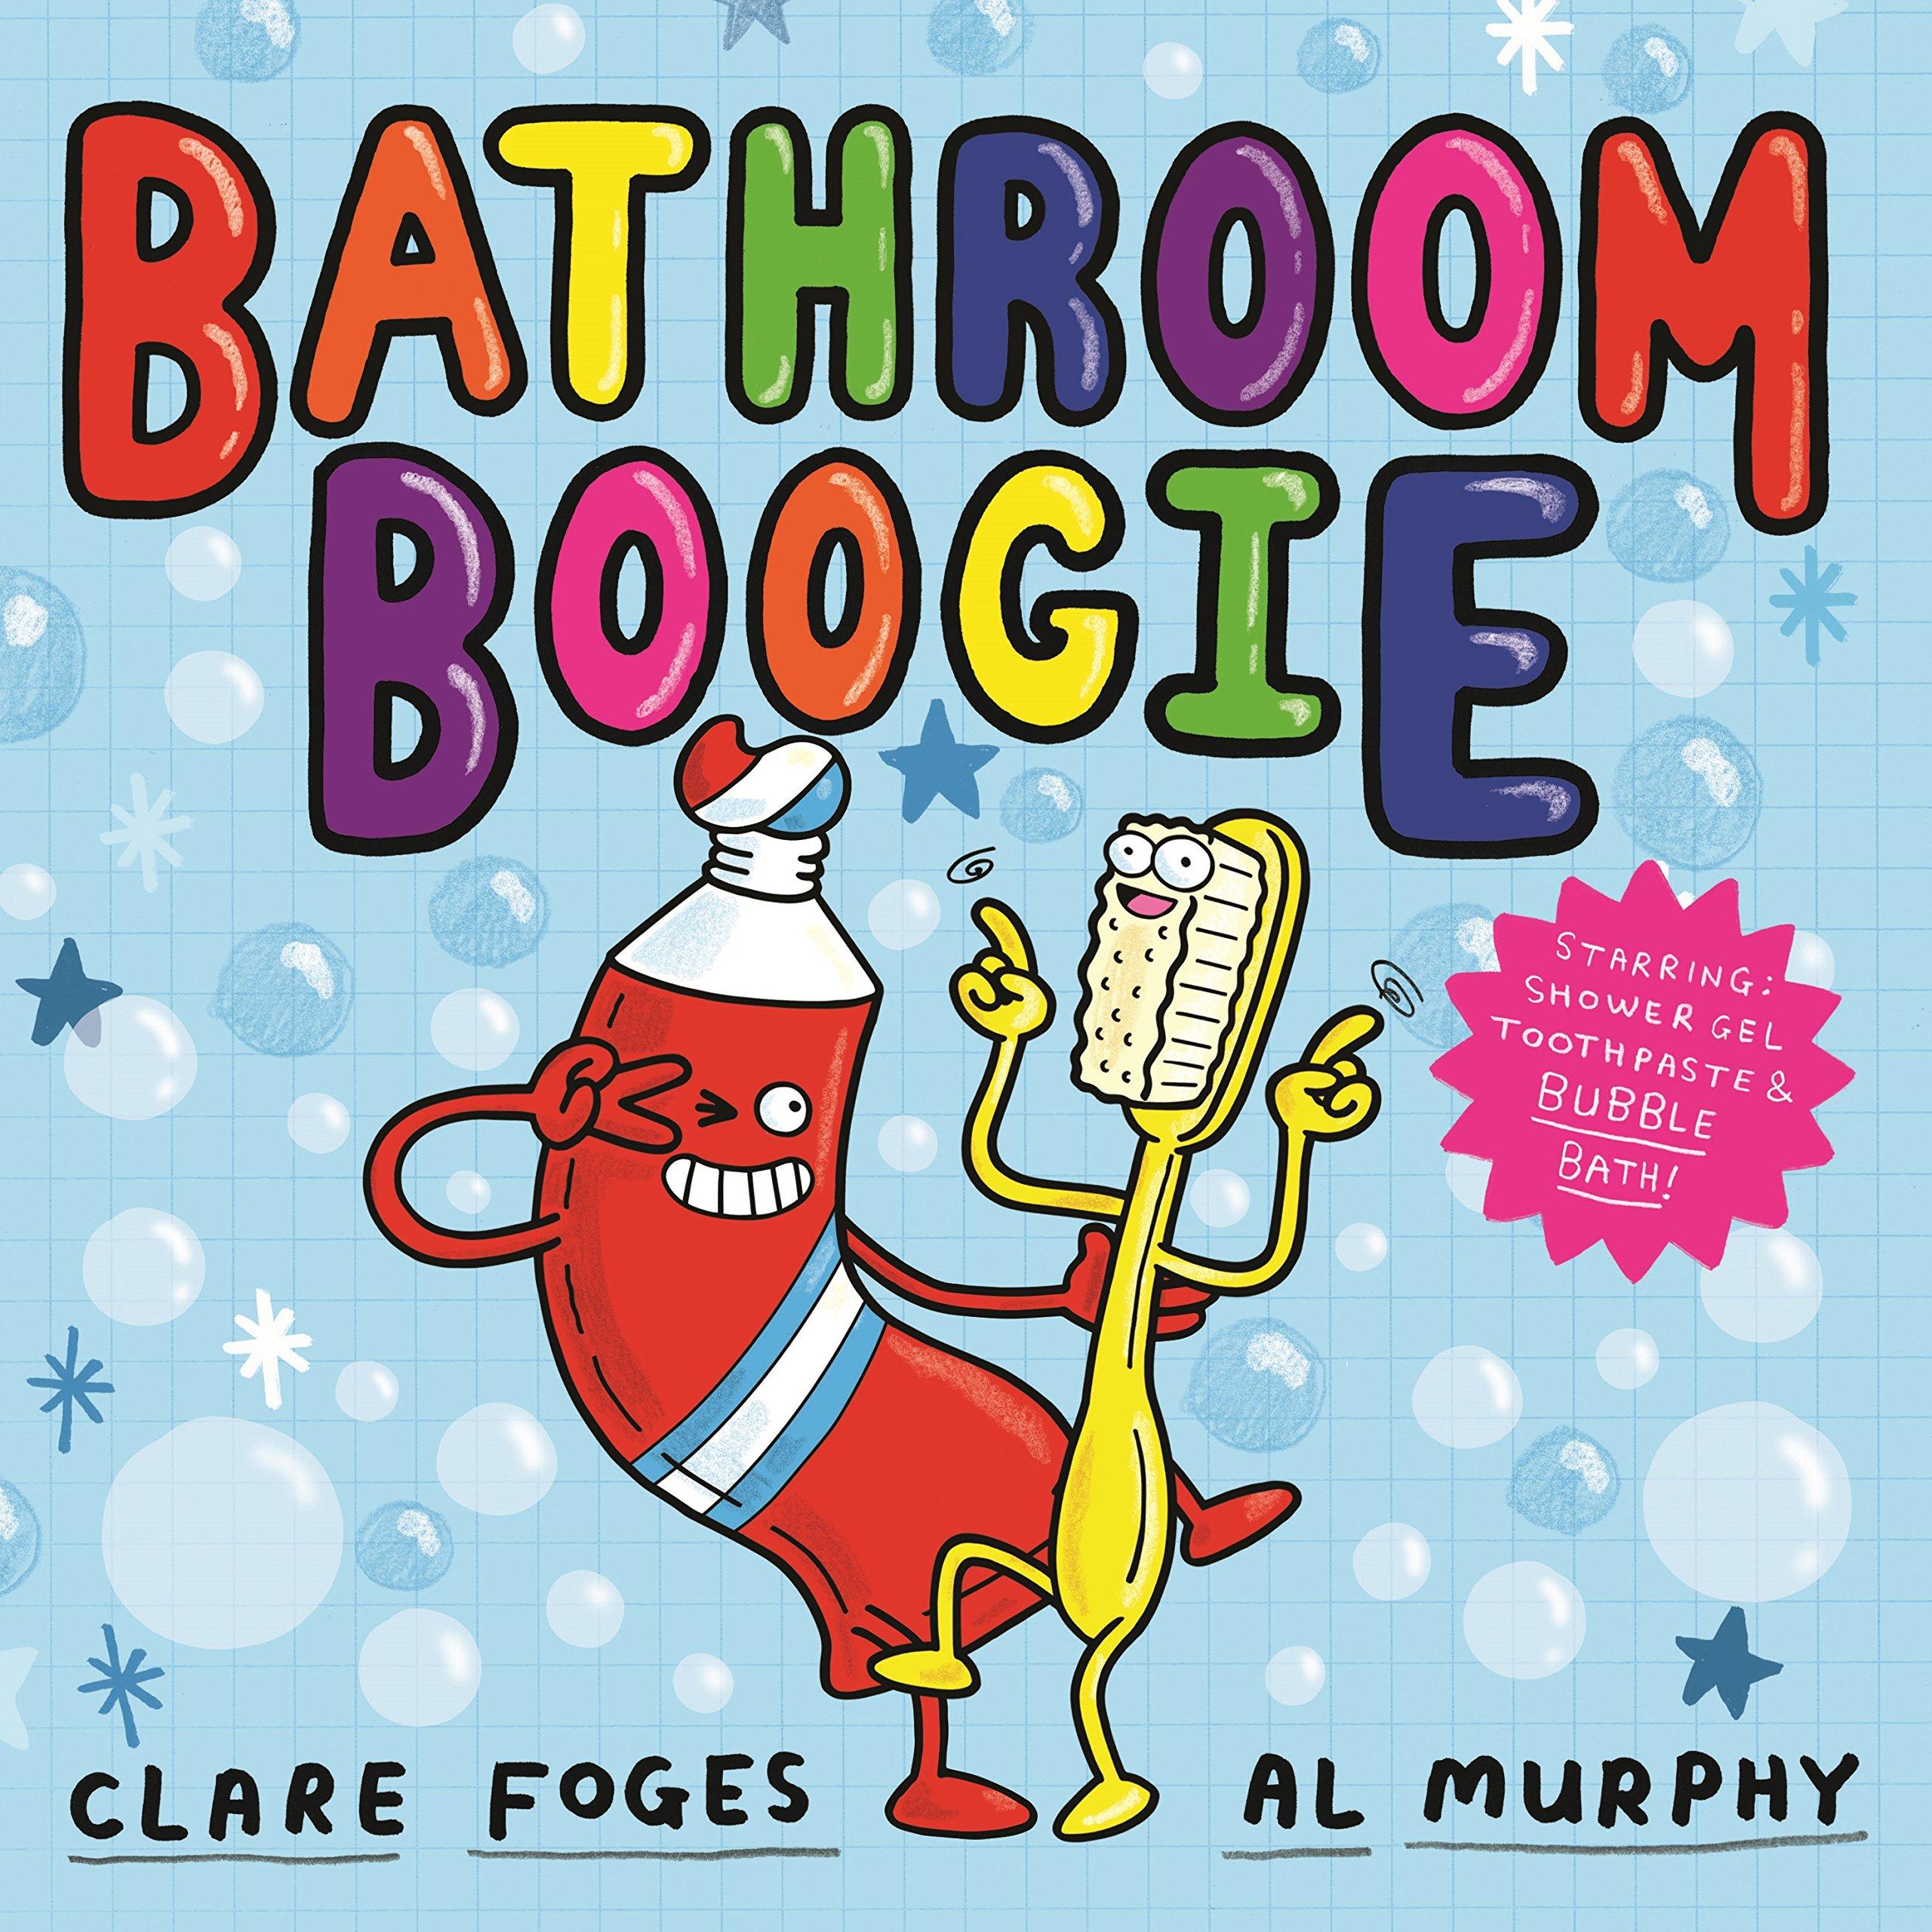 Bathroom Boogie (Kitchen Disco): Amazon.co.uk: Foges, Clare, Murphy, Al:  Books